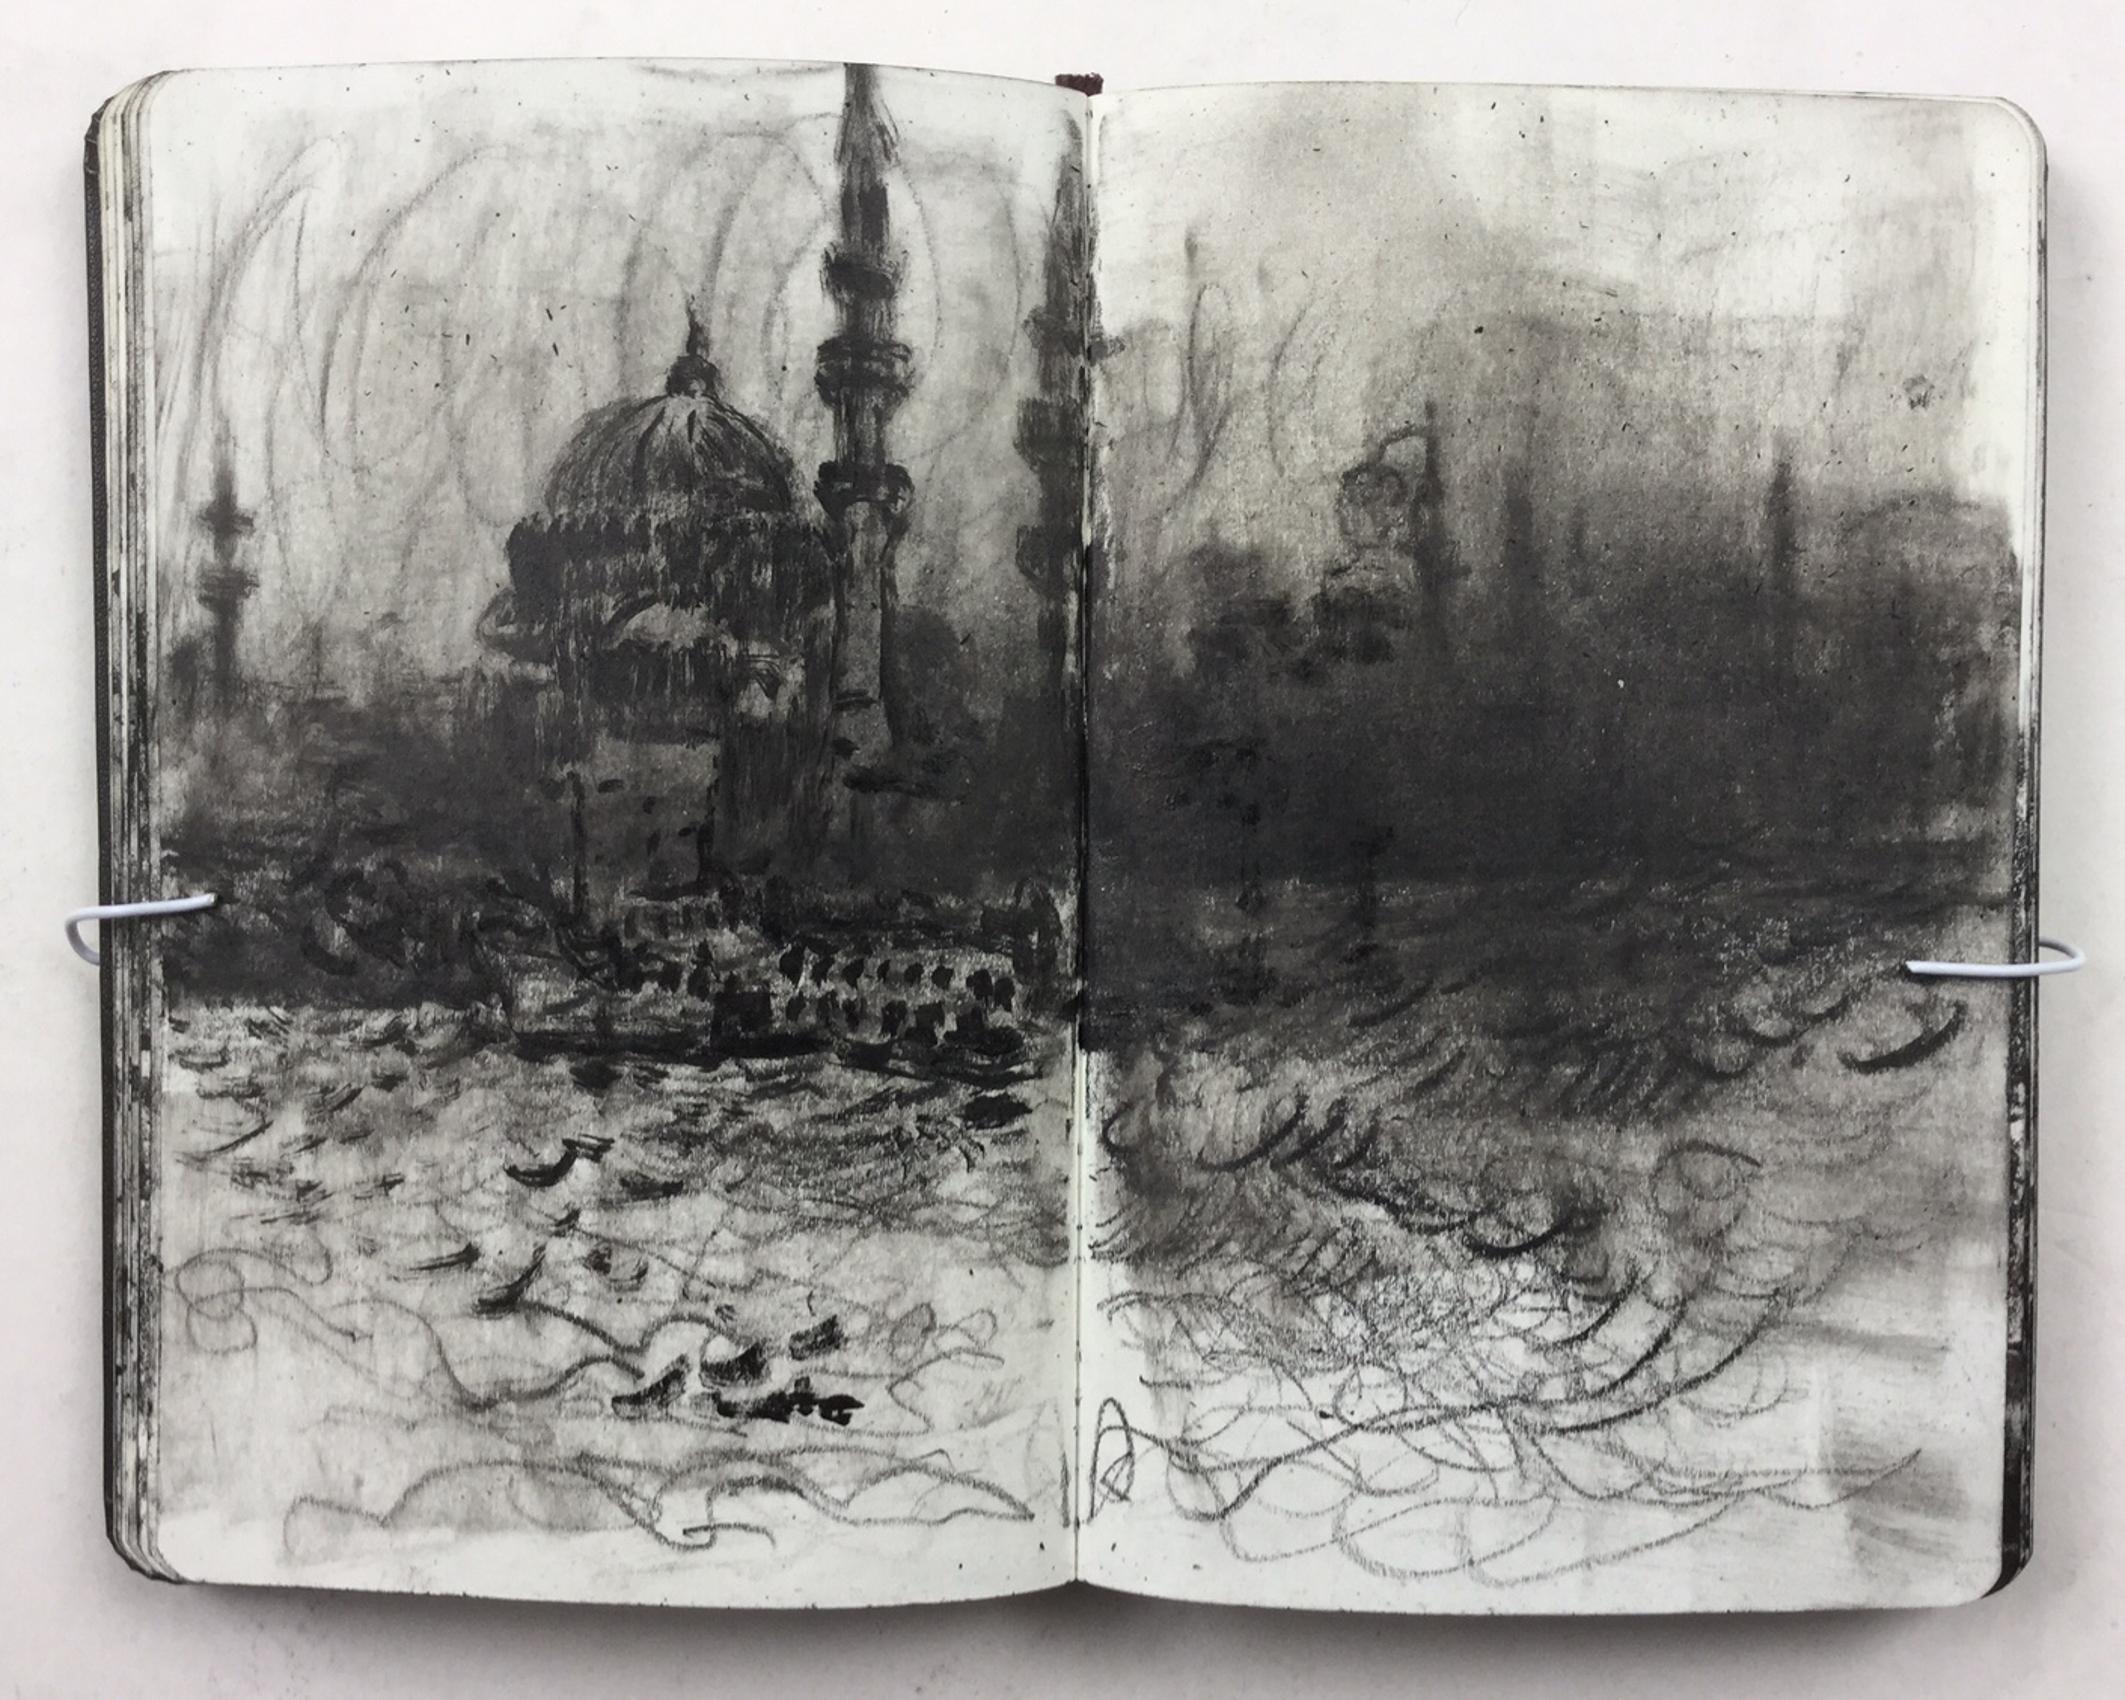 'Sketchbook, Istanbul' Christopher Green Ink, 14x18cm, 2017